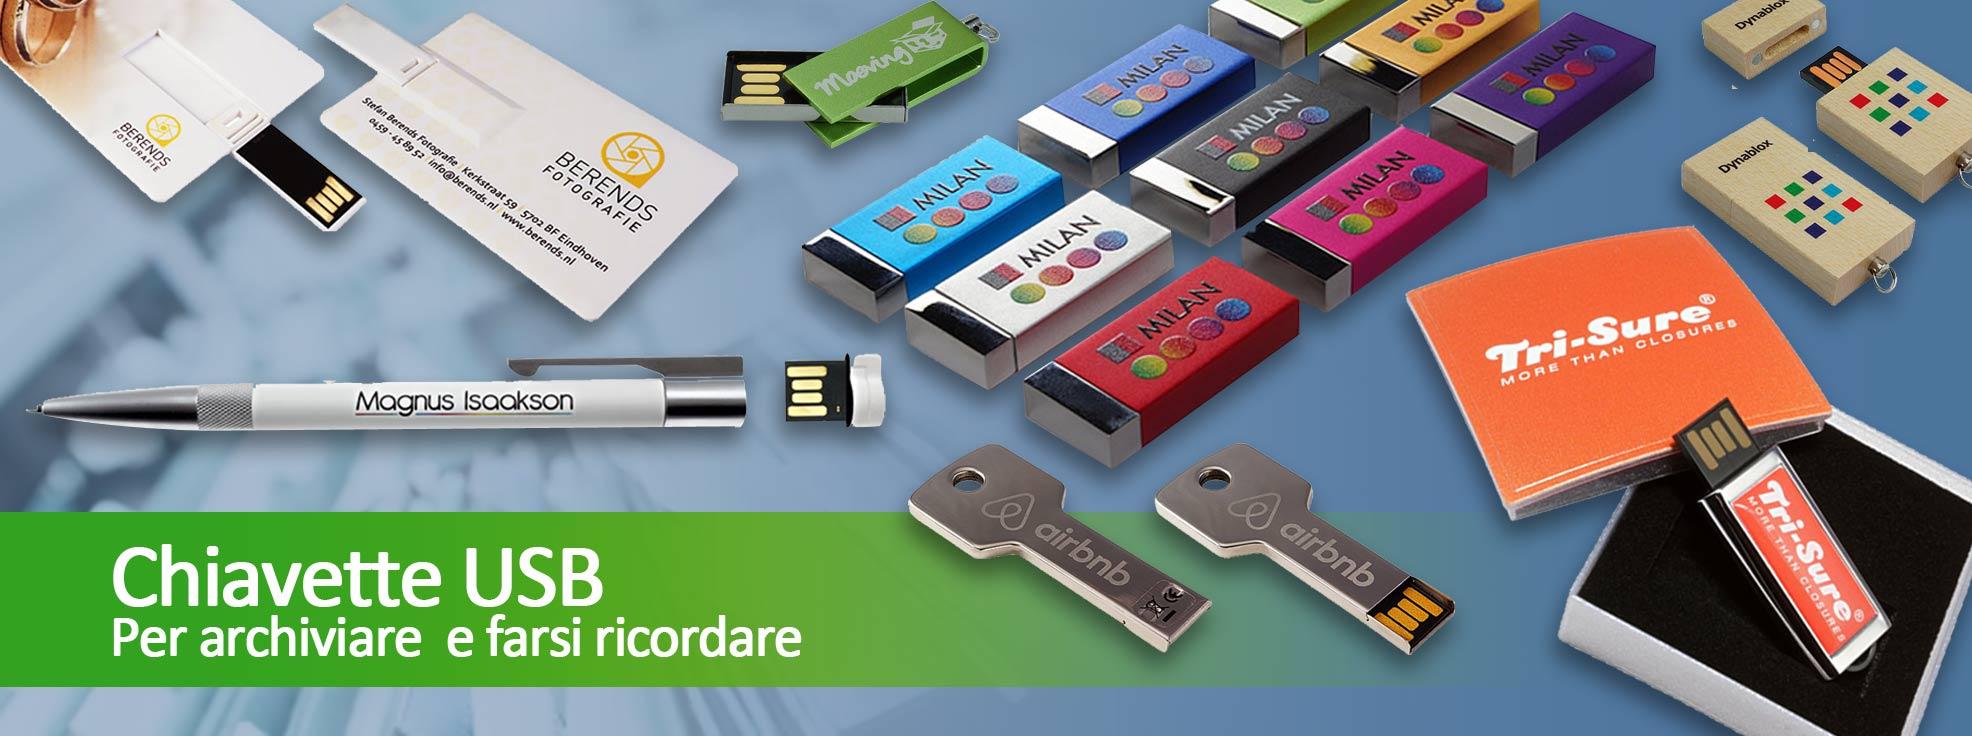 Chiavette USB promozionali